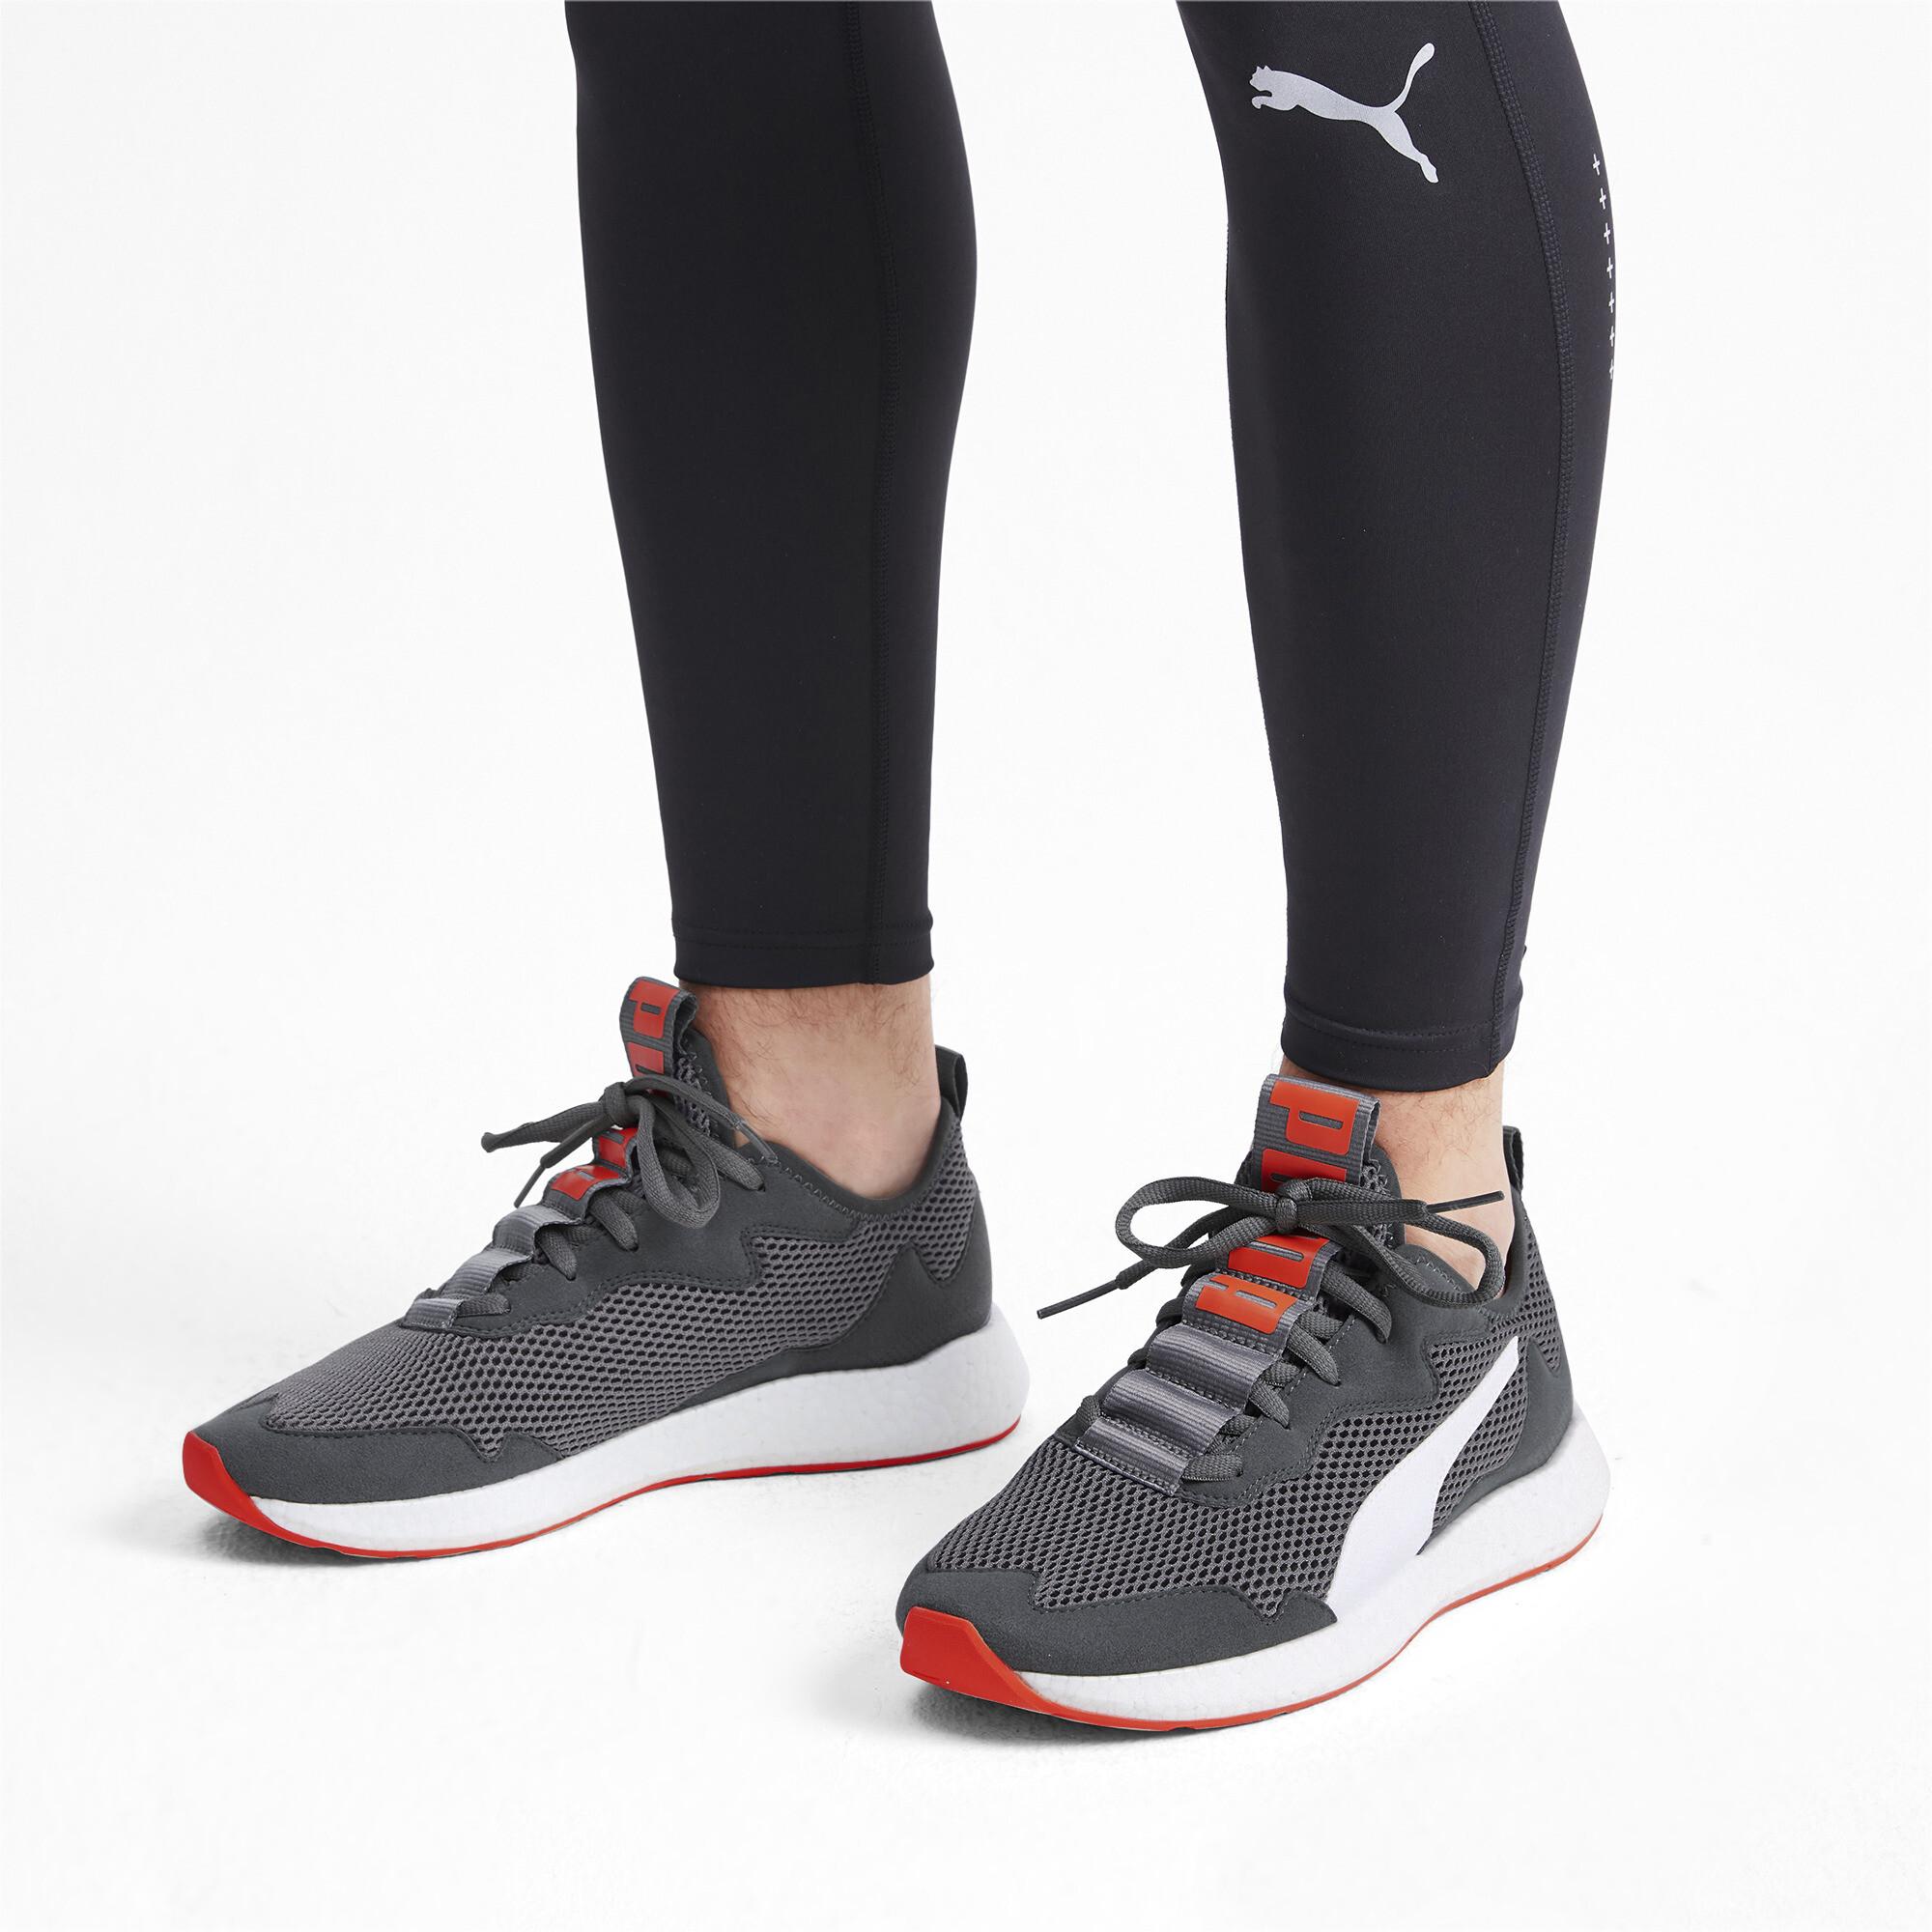 PUMA-NRGY-Neko-Skim-Men-s-Running-Shoes-Men-Shoe-Running thumbnail 10